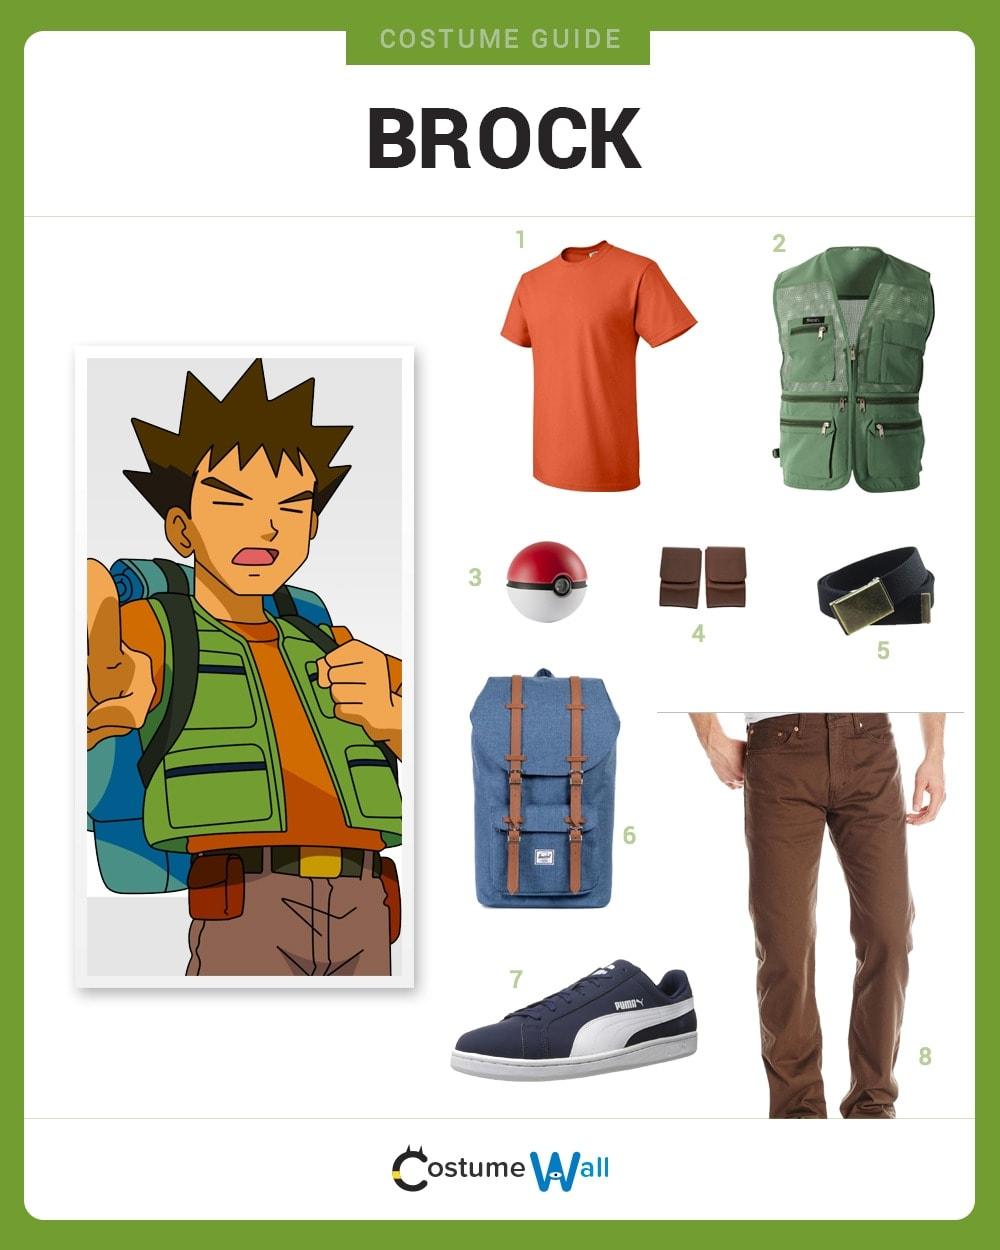 dress like brock costume diy outfit costume wall